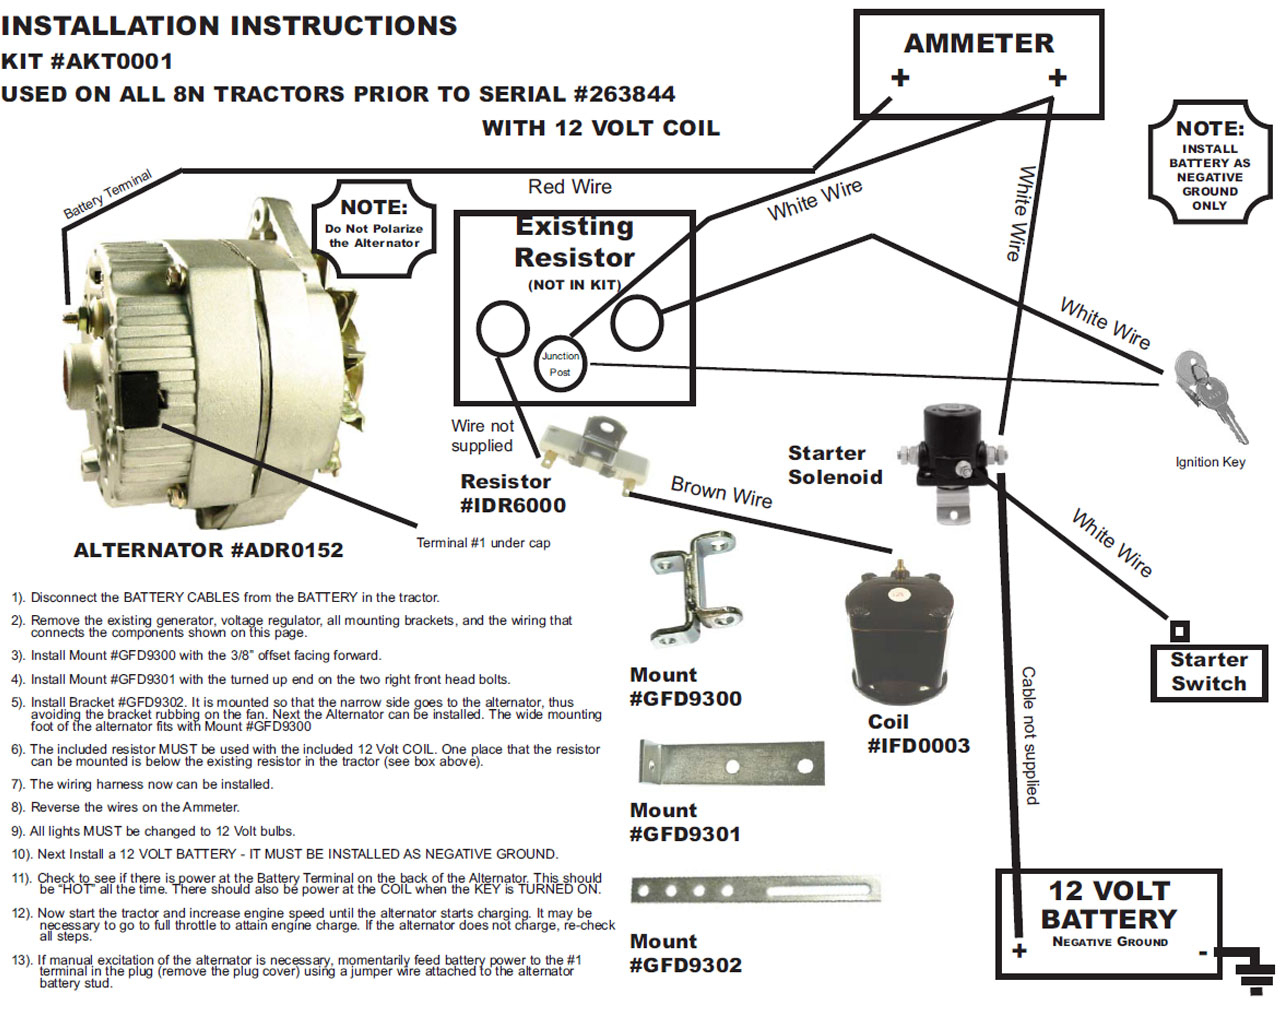 Ford 8N Alternator Conversion Diagram | Manual E-Books - Ford 8N 12 Volt Conversion Wiring Diagram